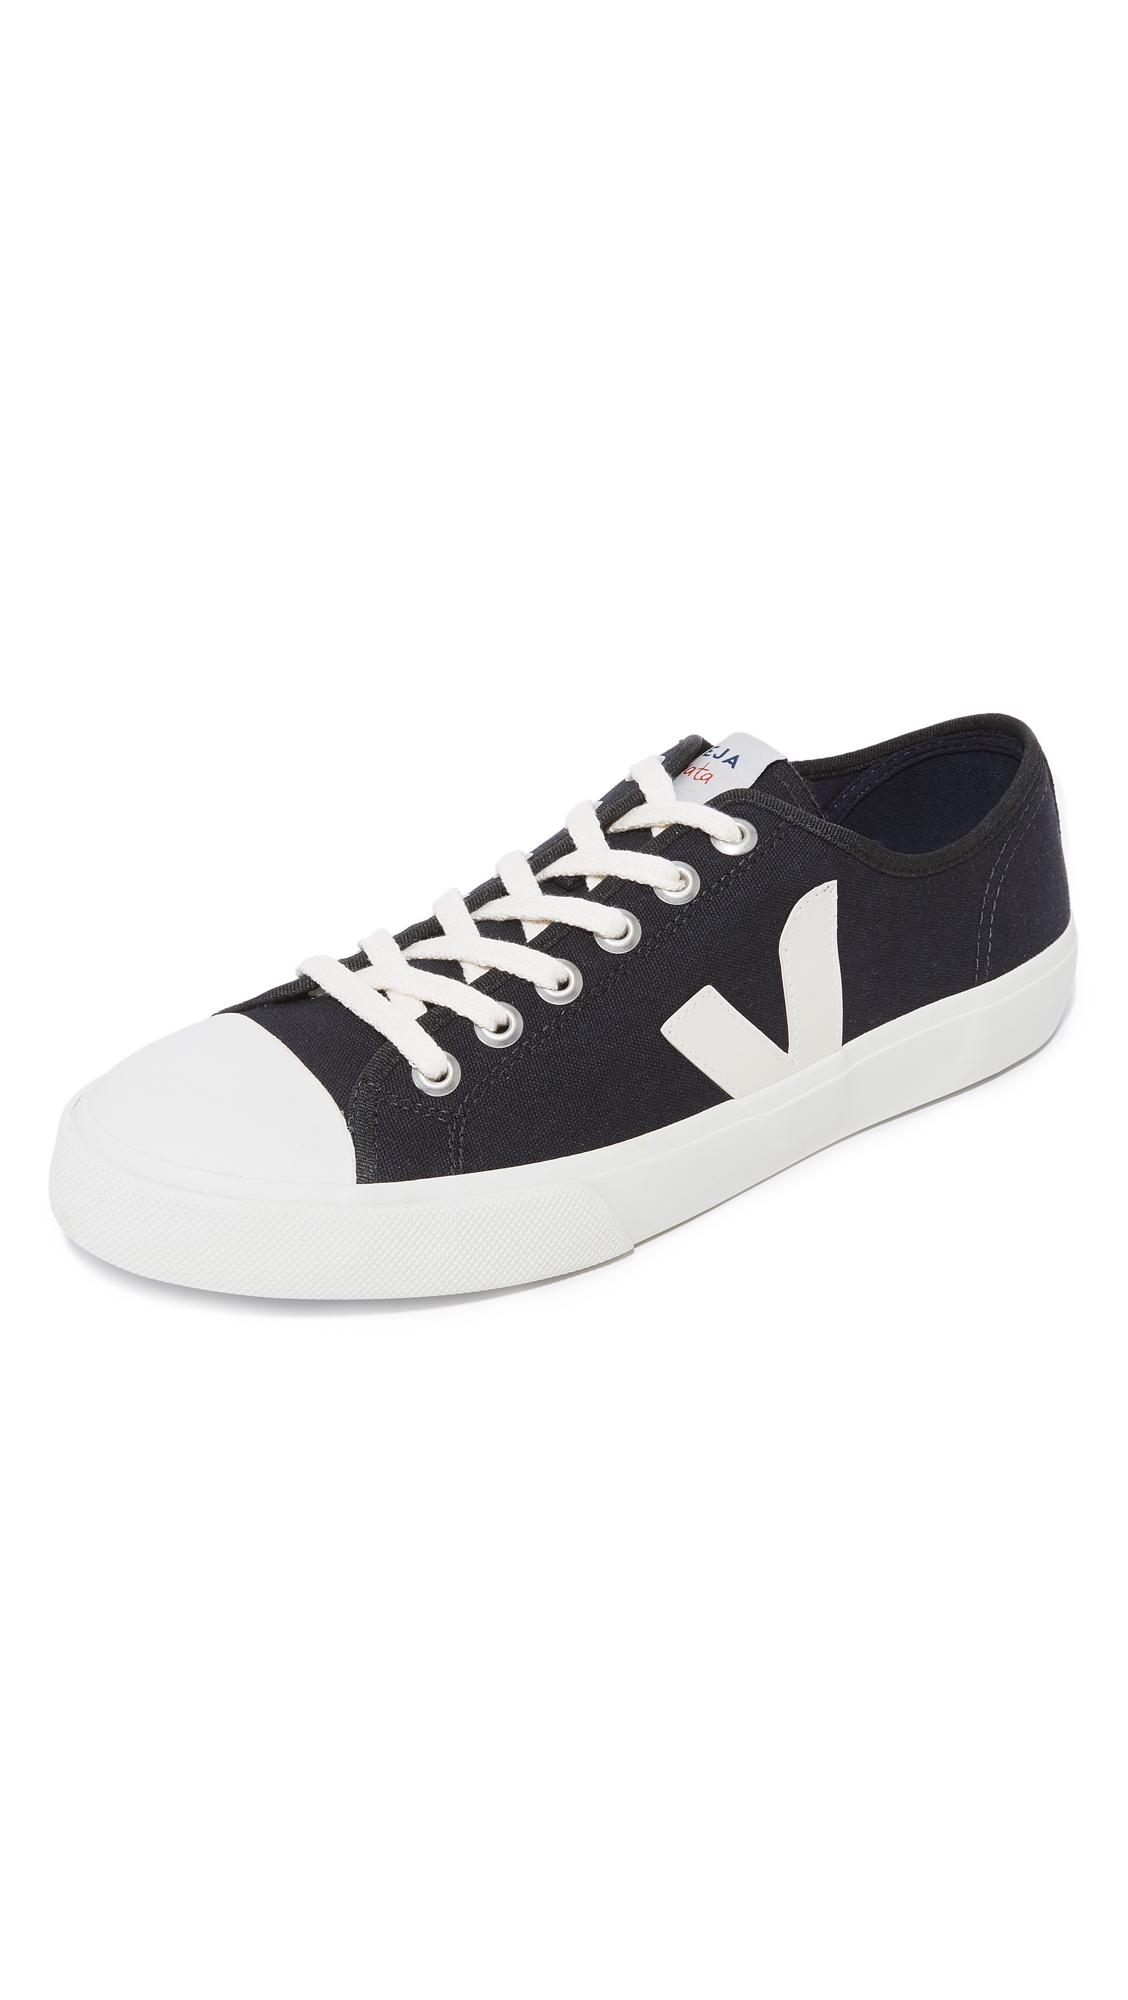 VEJA Wata Rubber-Trimmed Organic Cotton-Canvas Sneakers - Black